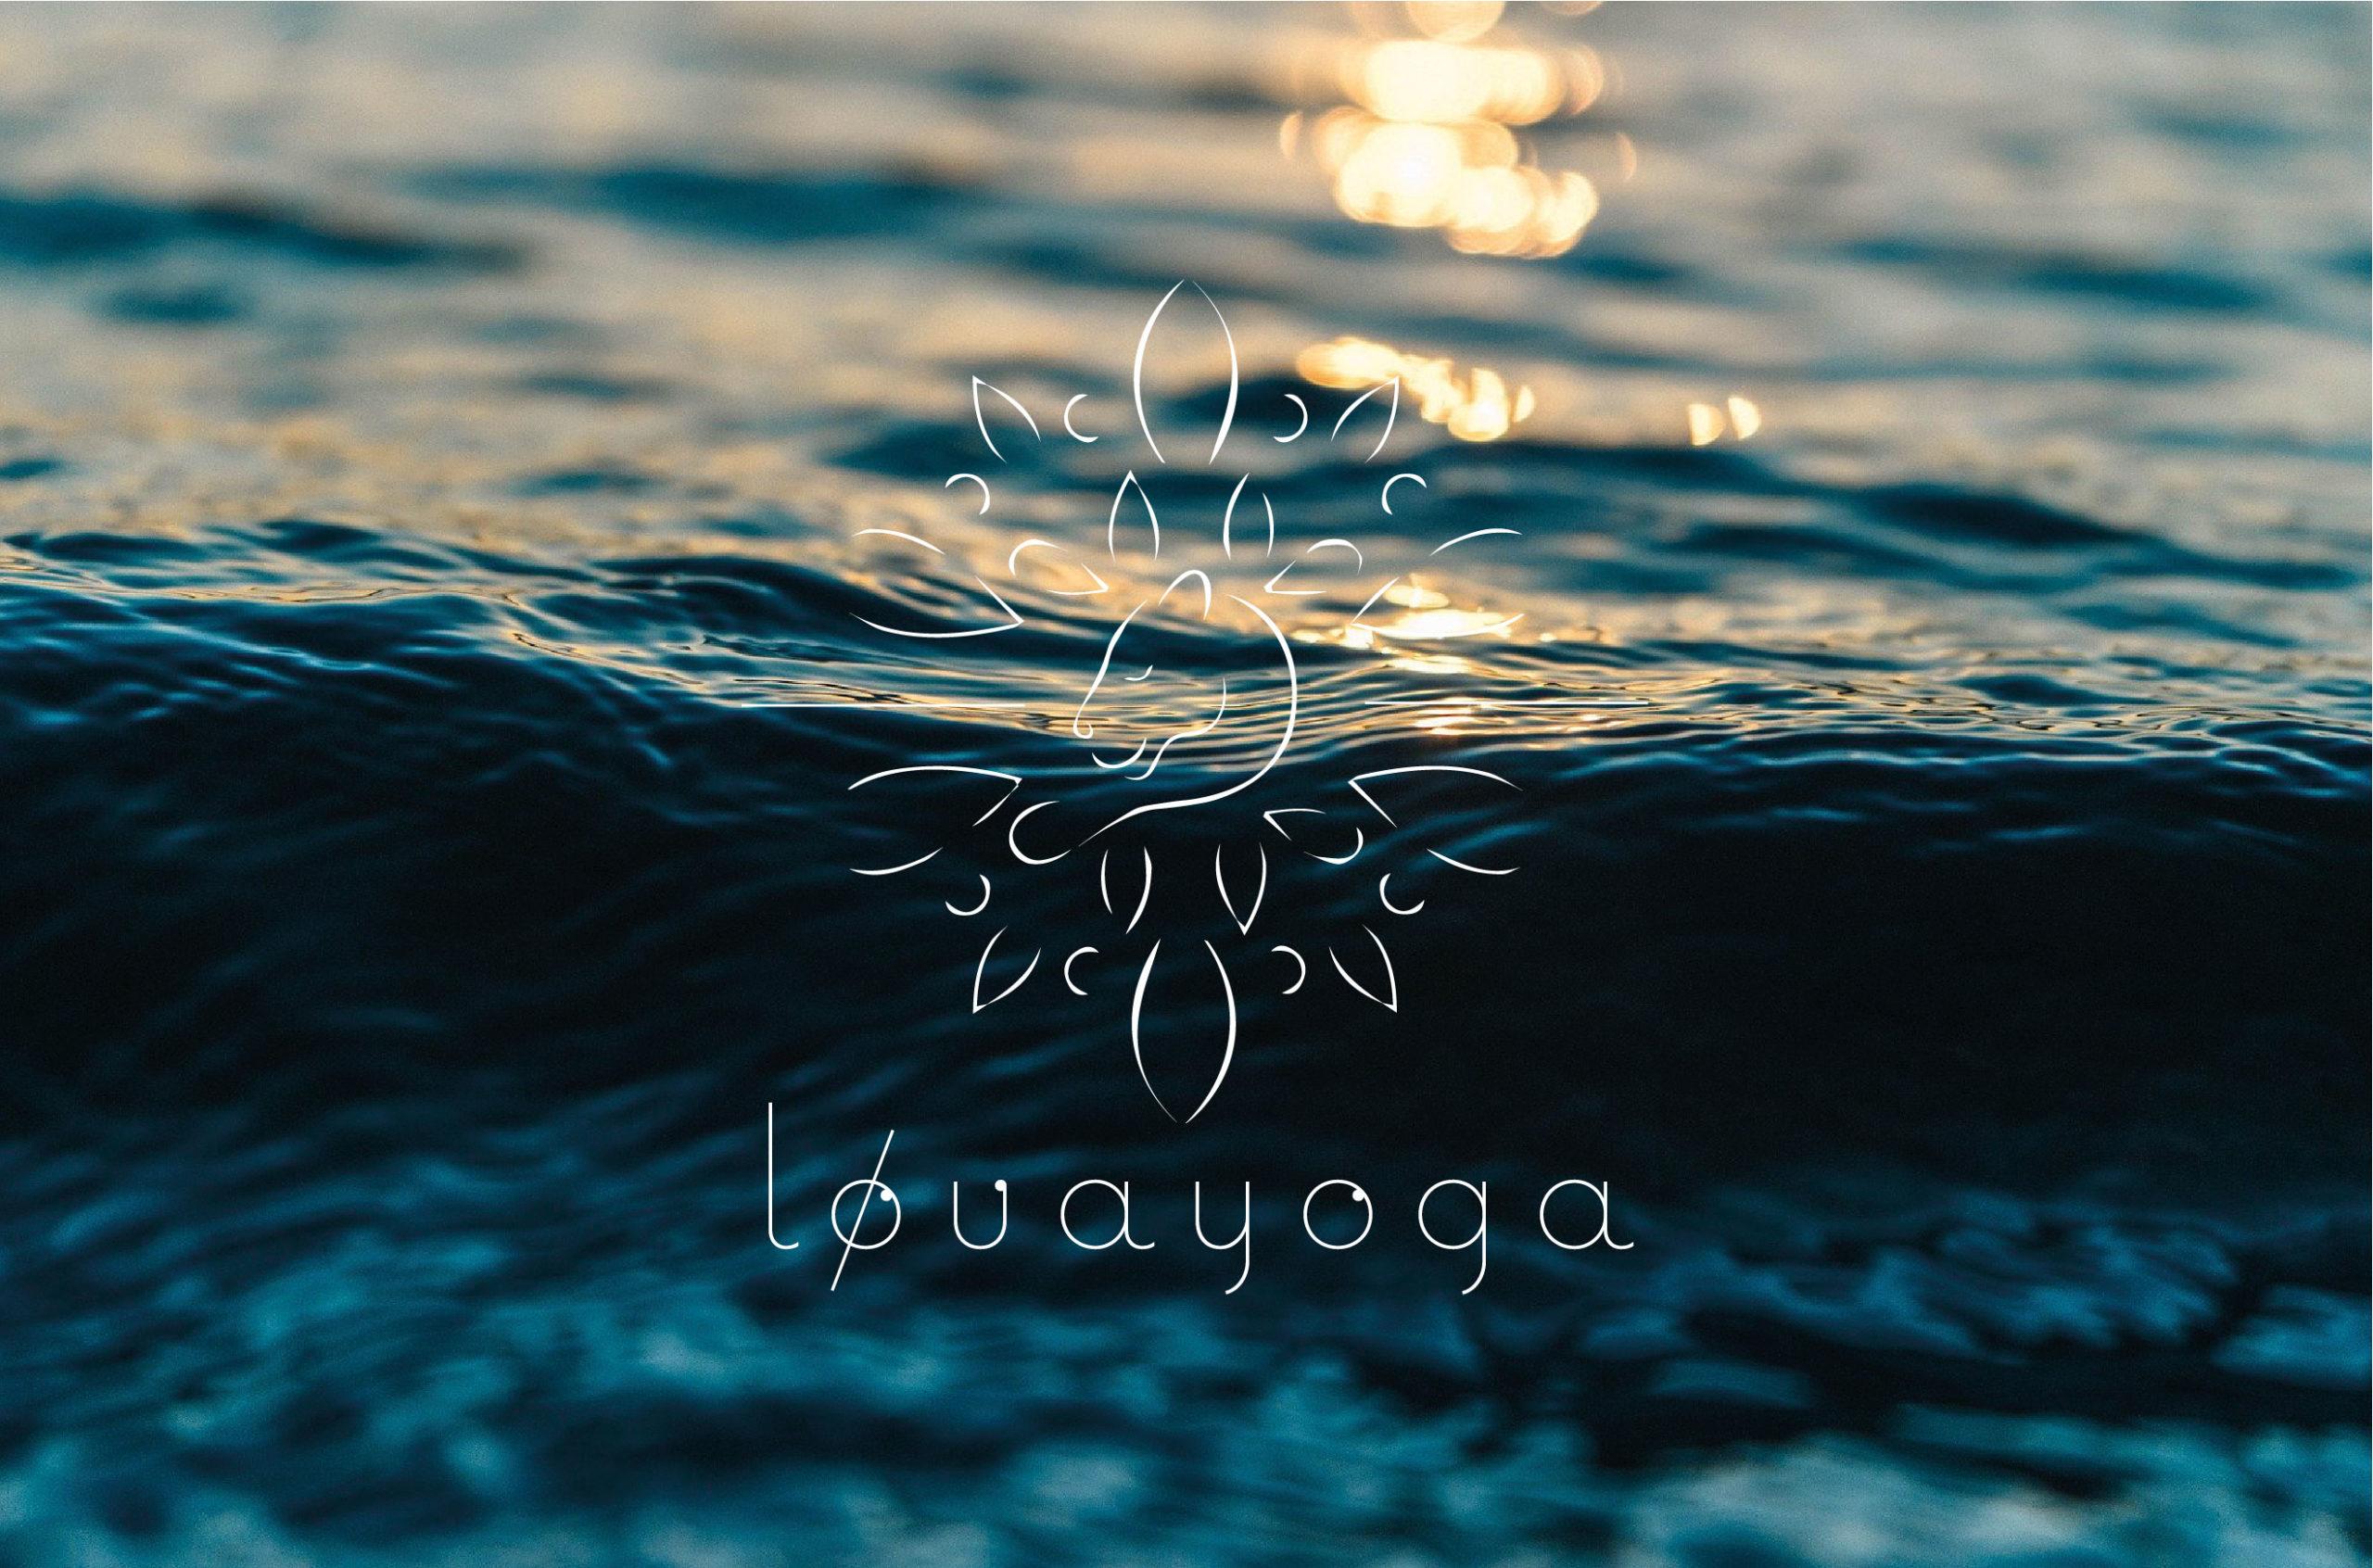 branding-lovayoga-julien-guichard-digital-pays-basque